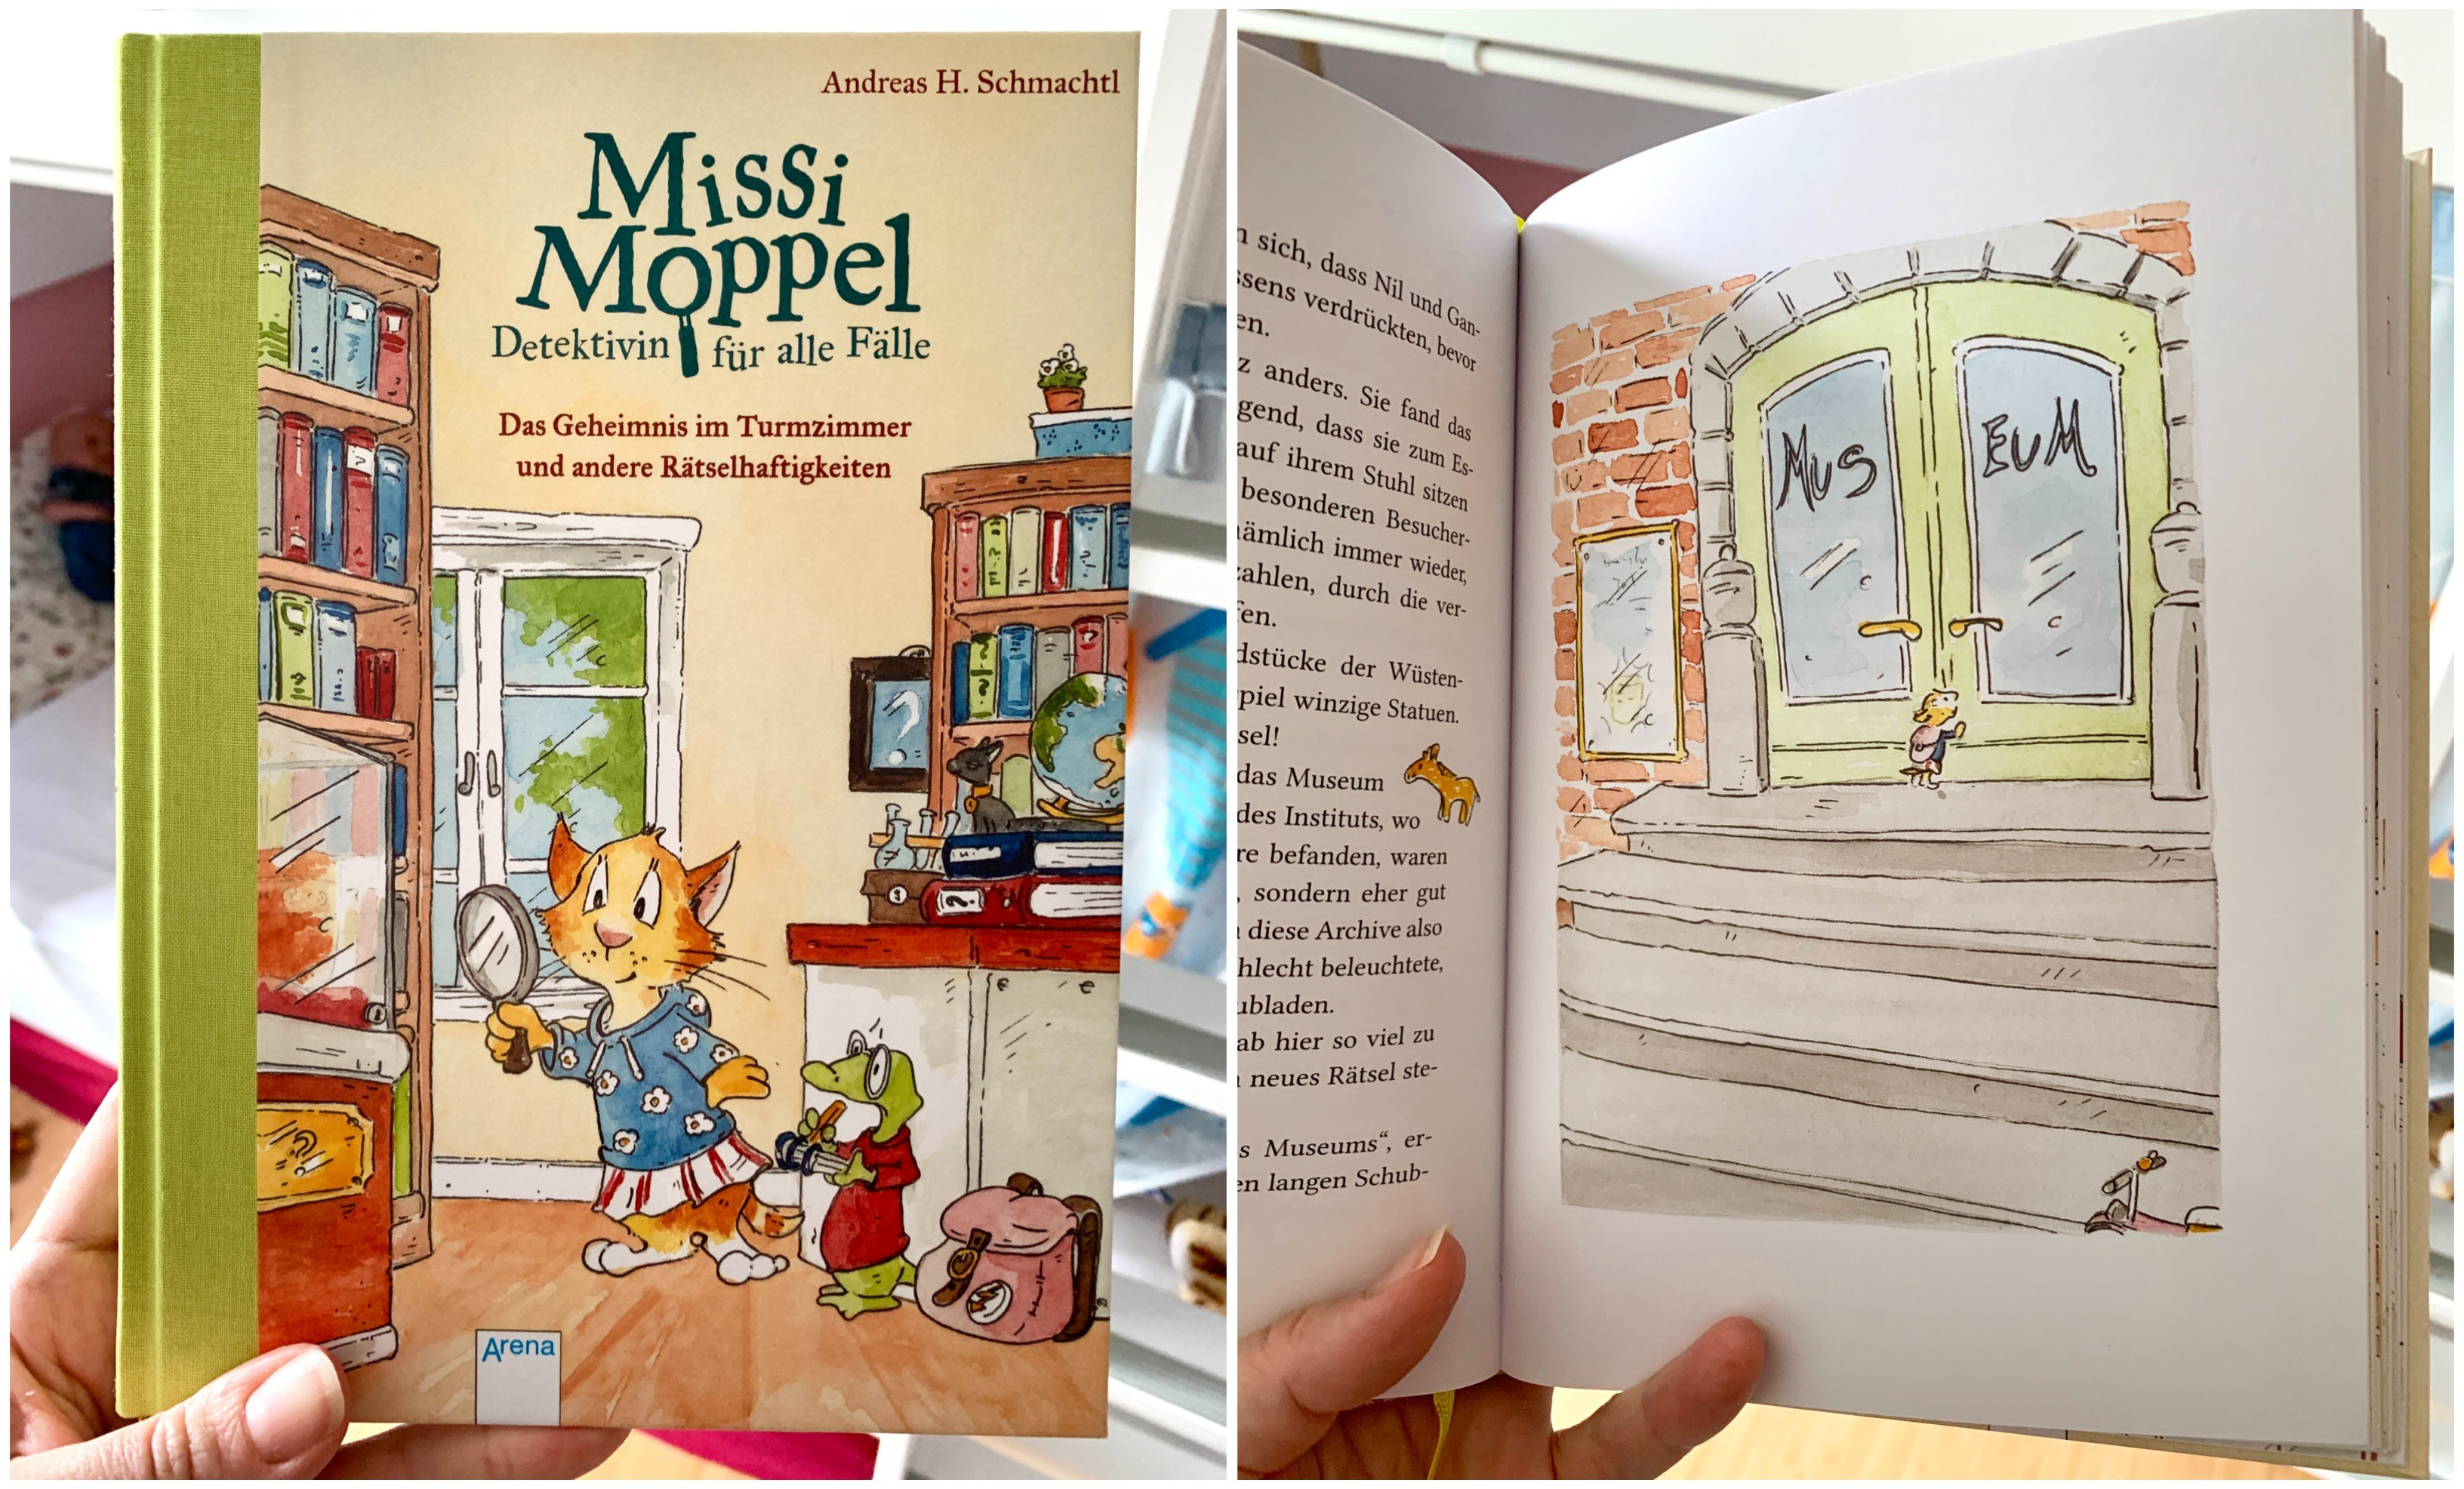 Missi Moppel